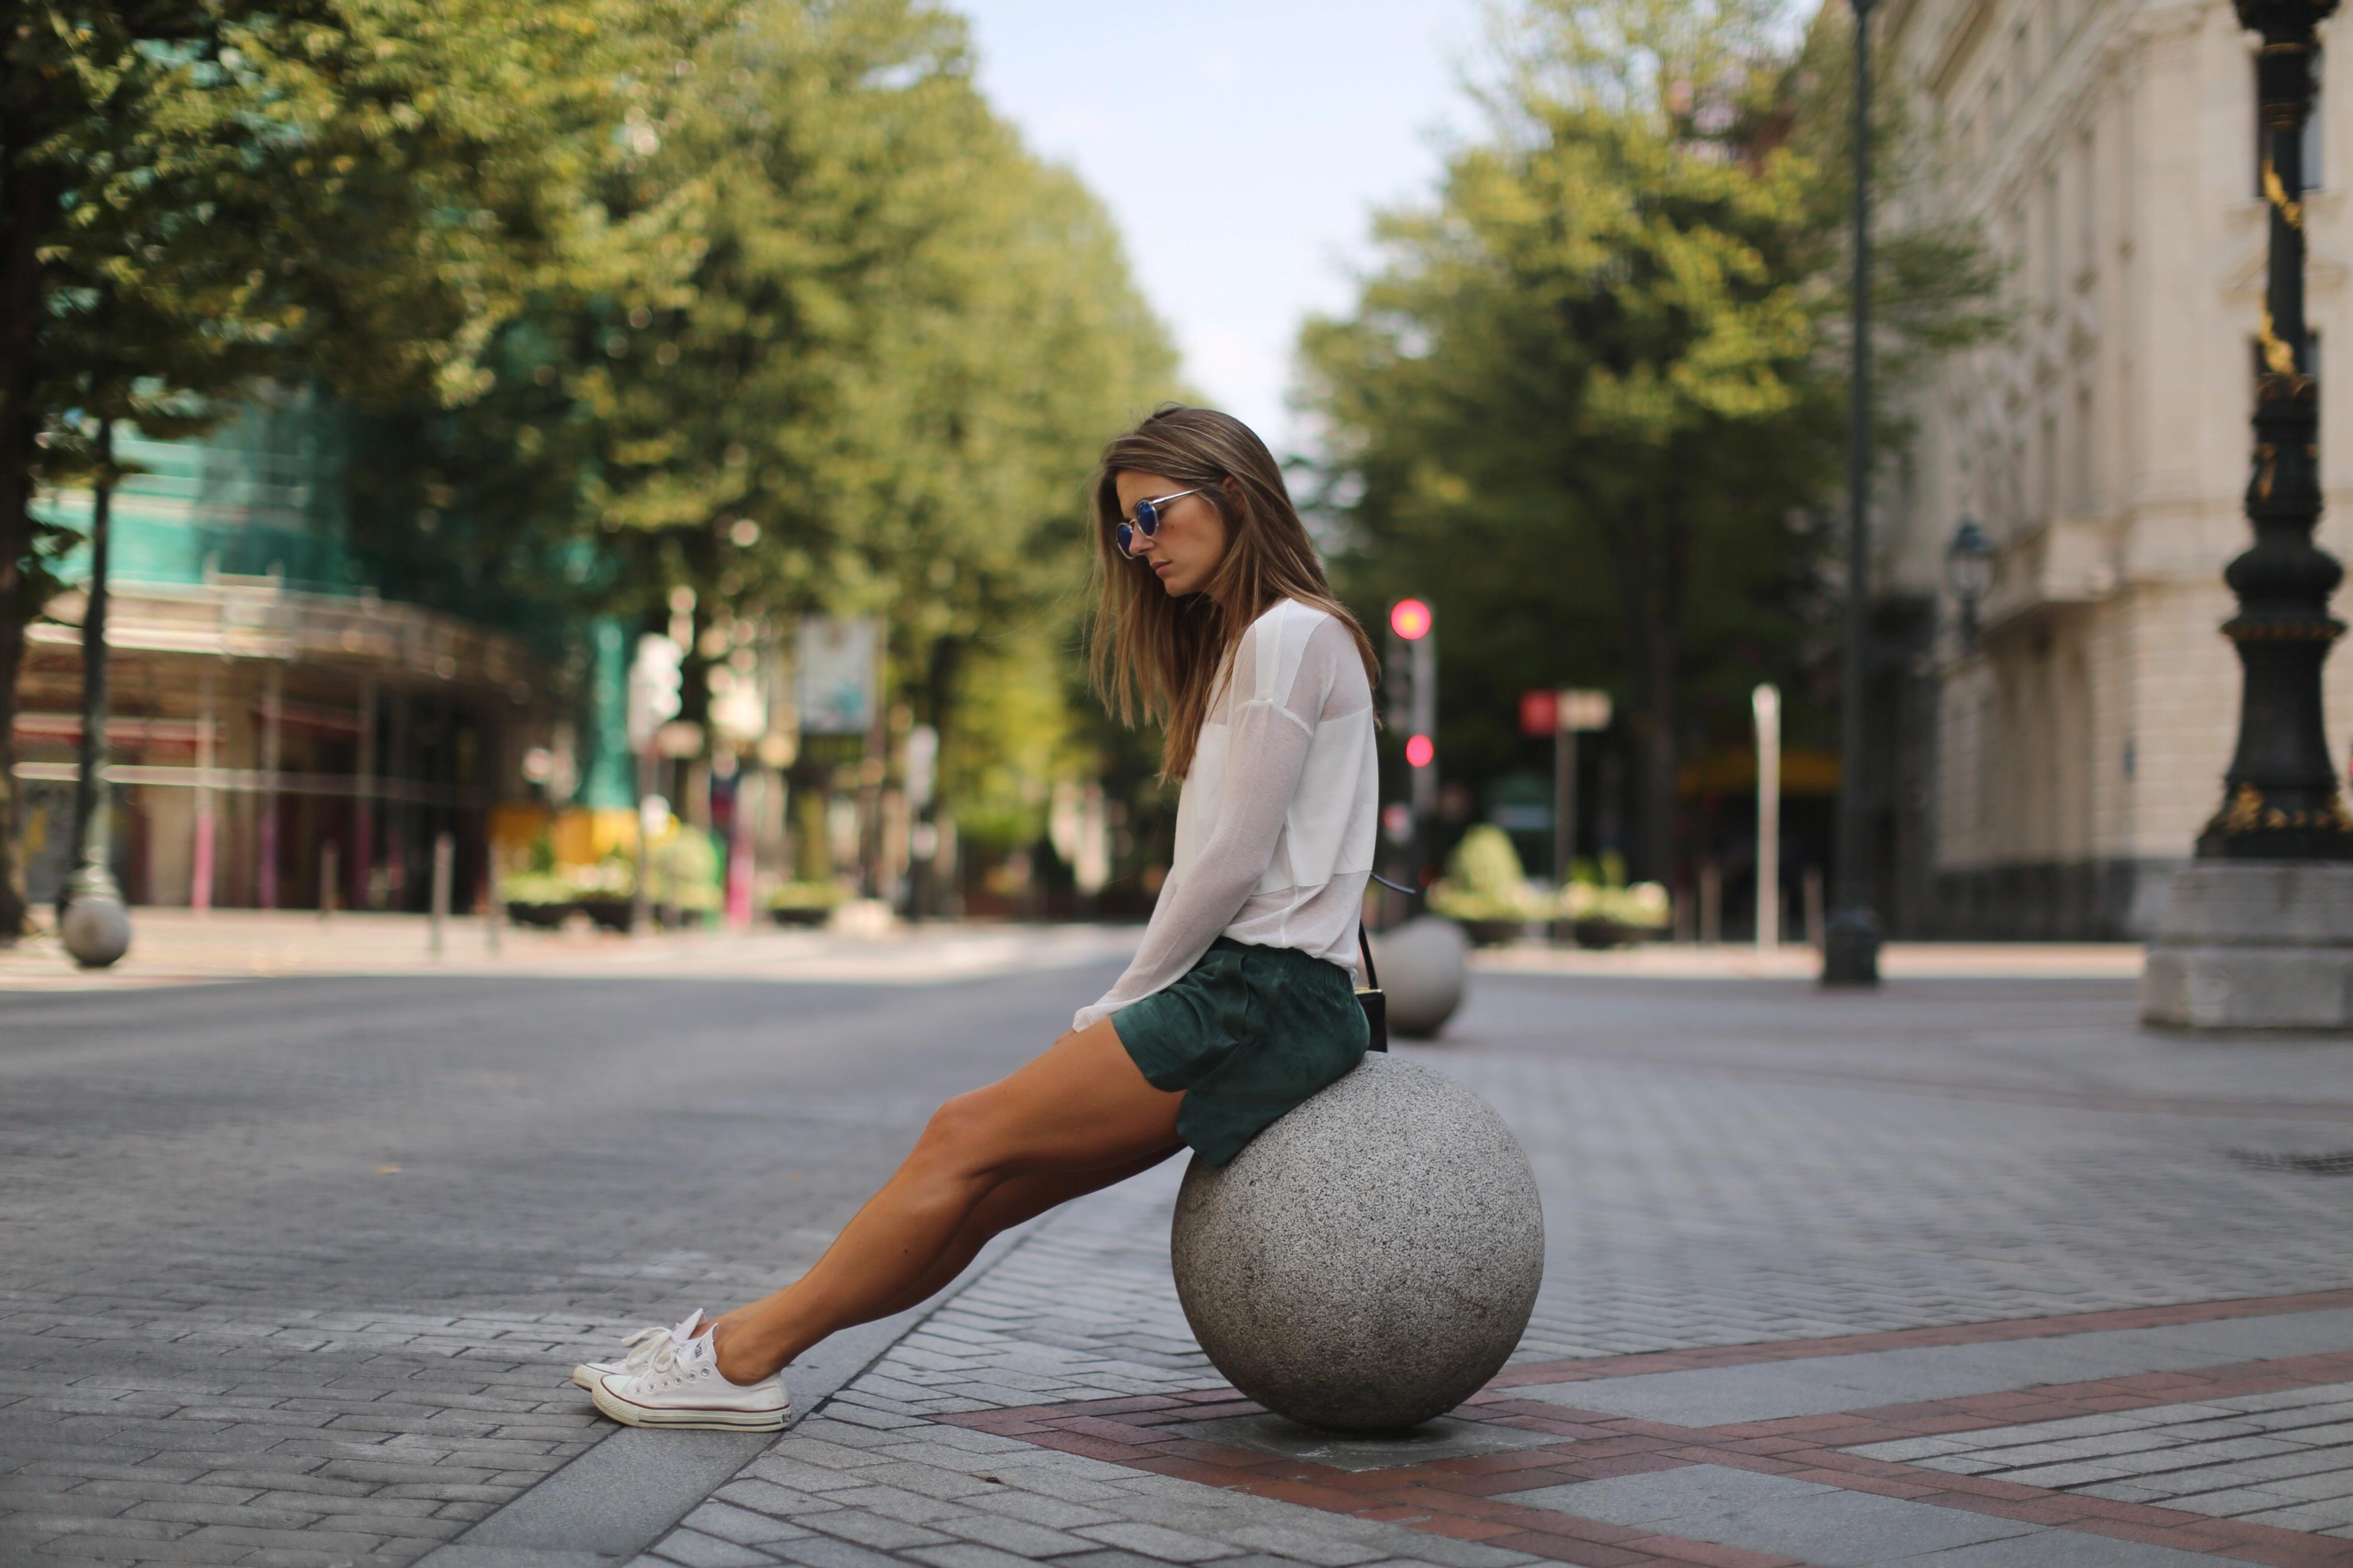 Clochet_h&m_trend_suede_shorts_converse_celine_trio_bag_03